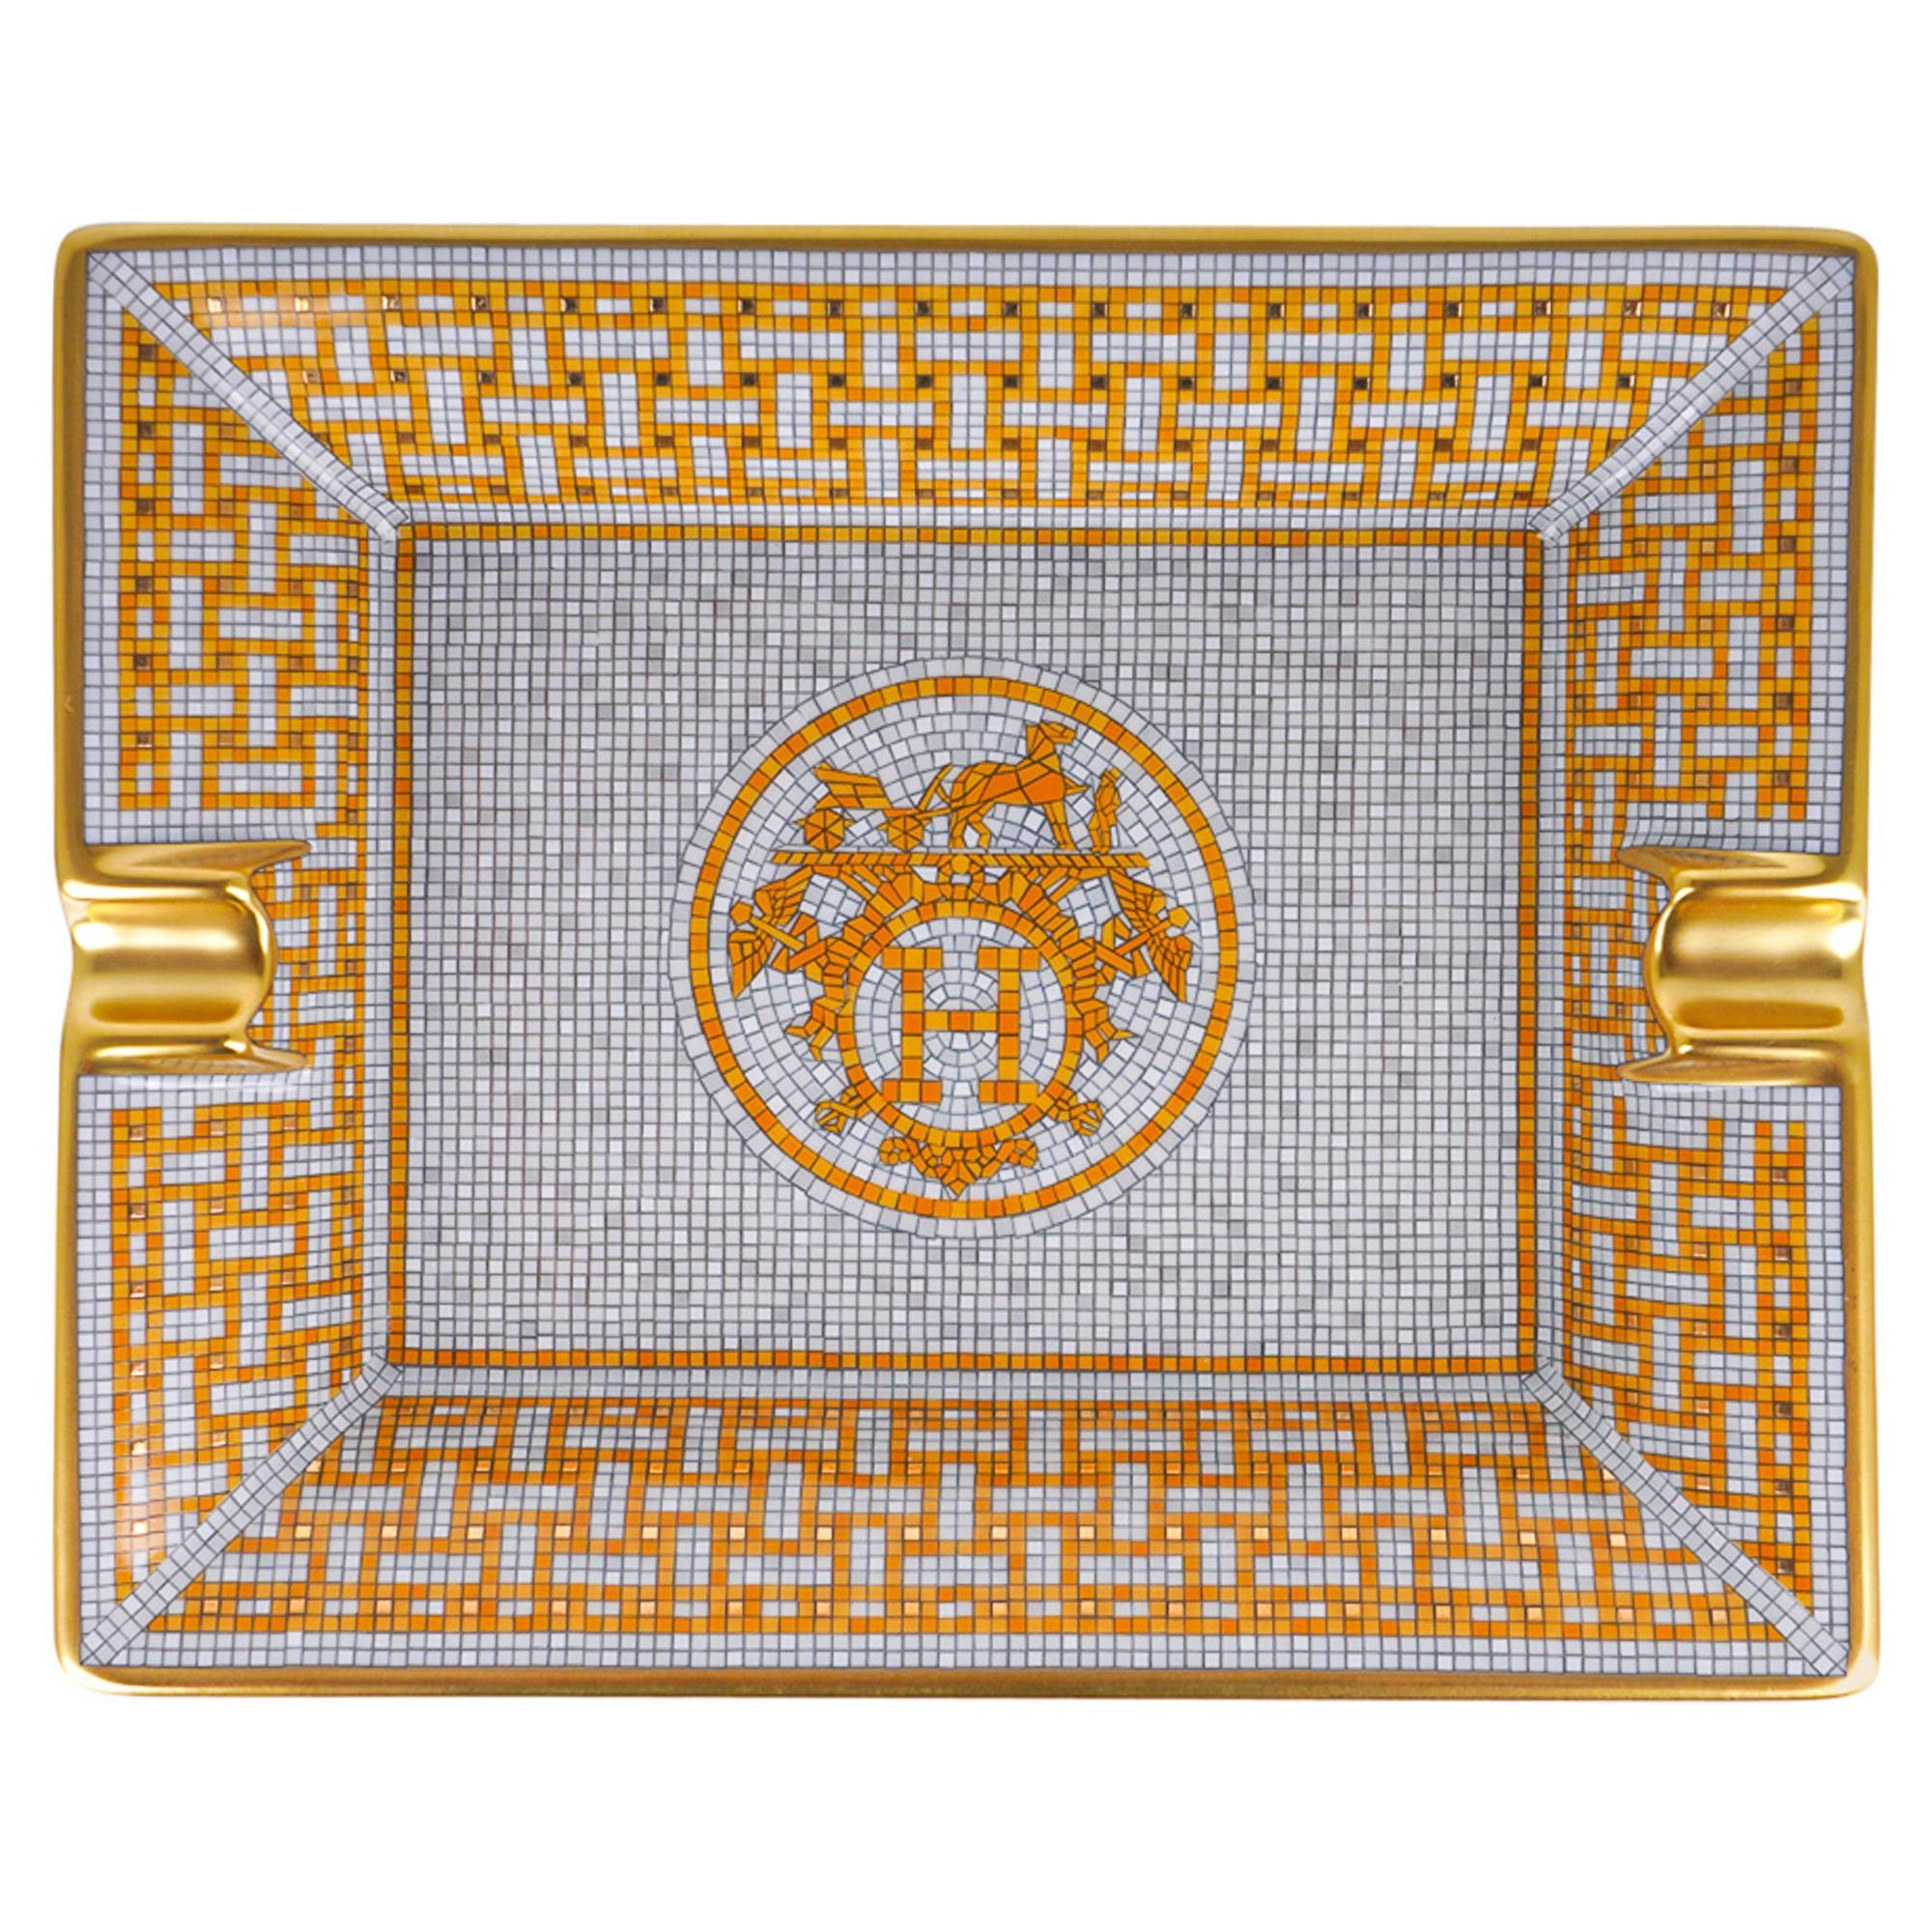 Hermes Mosaique Au 24 Gold Ashtray Limoges Porcelain Tray New w/Box